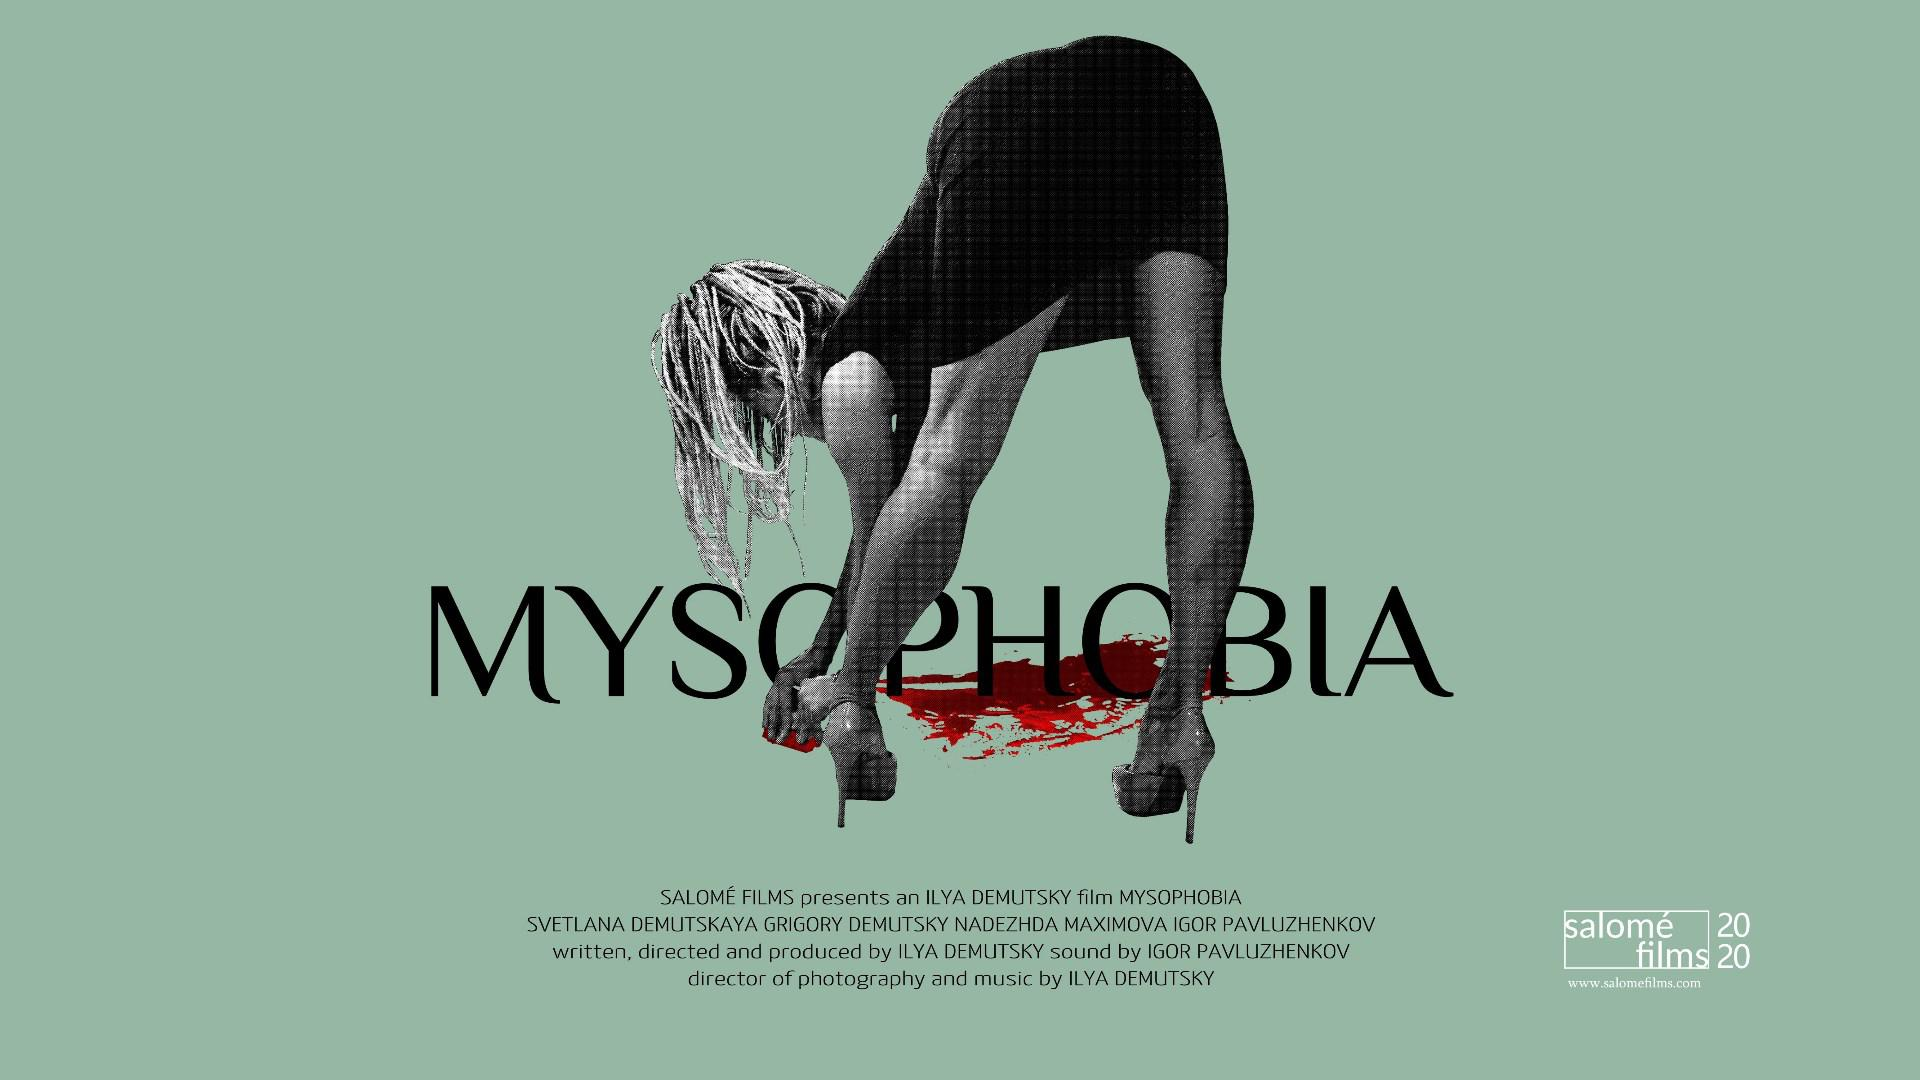 Mysophobia